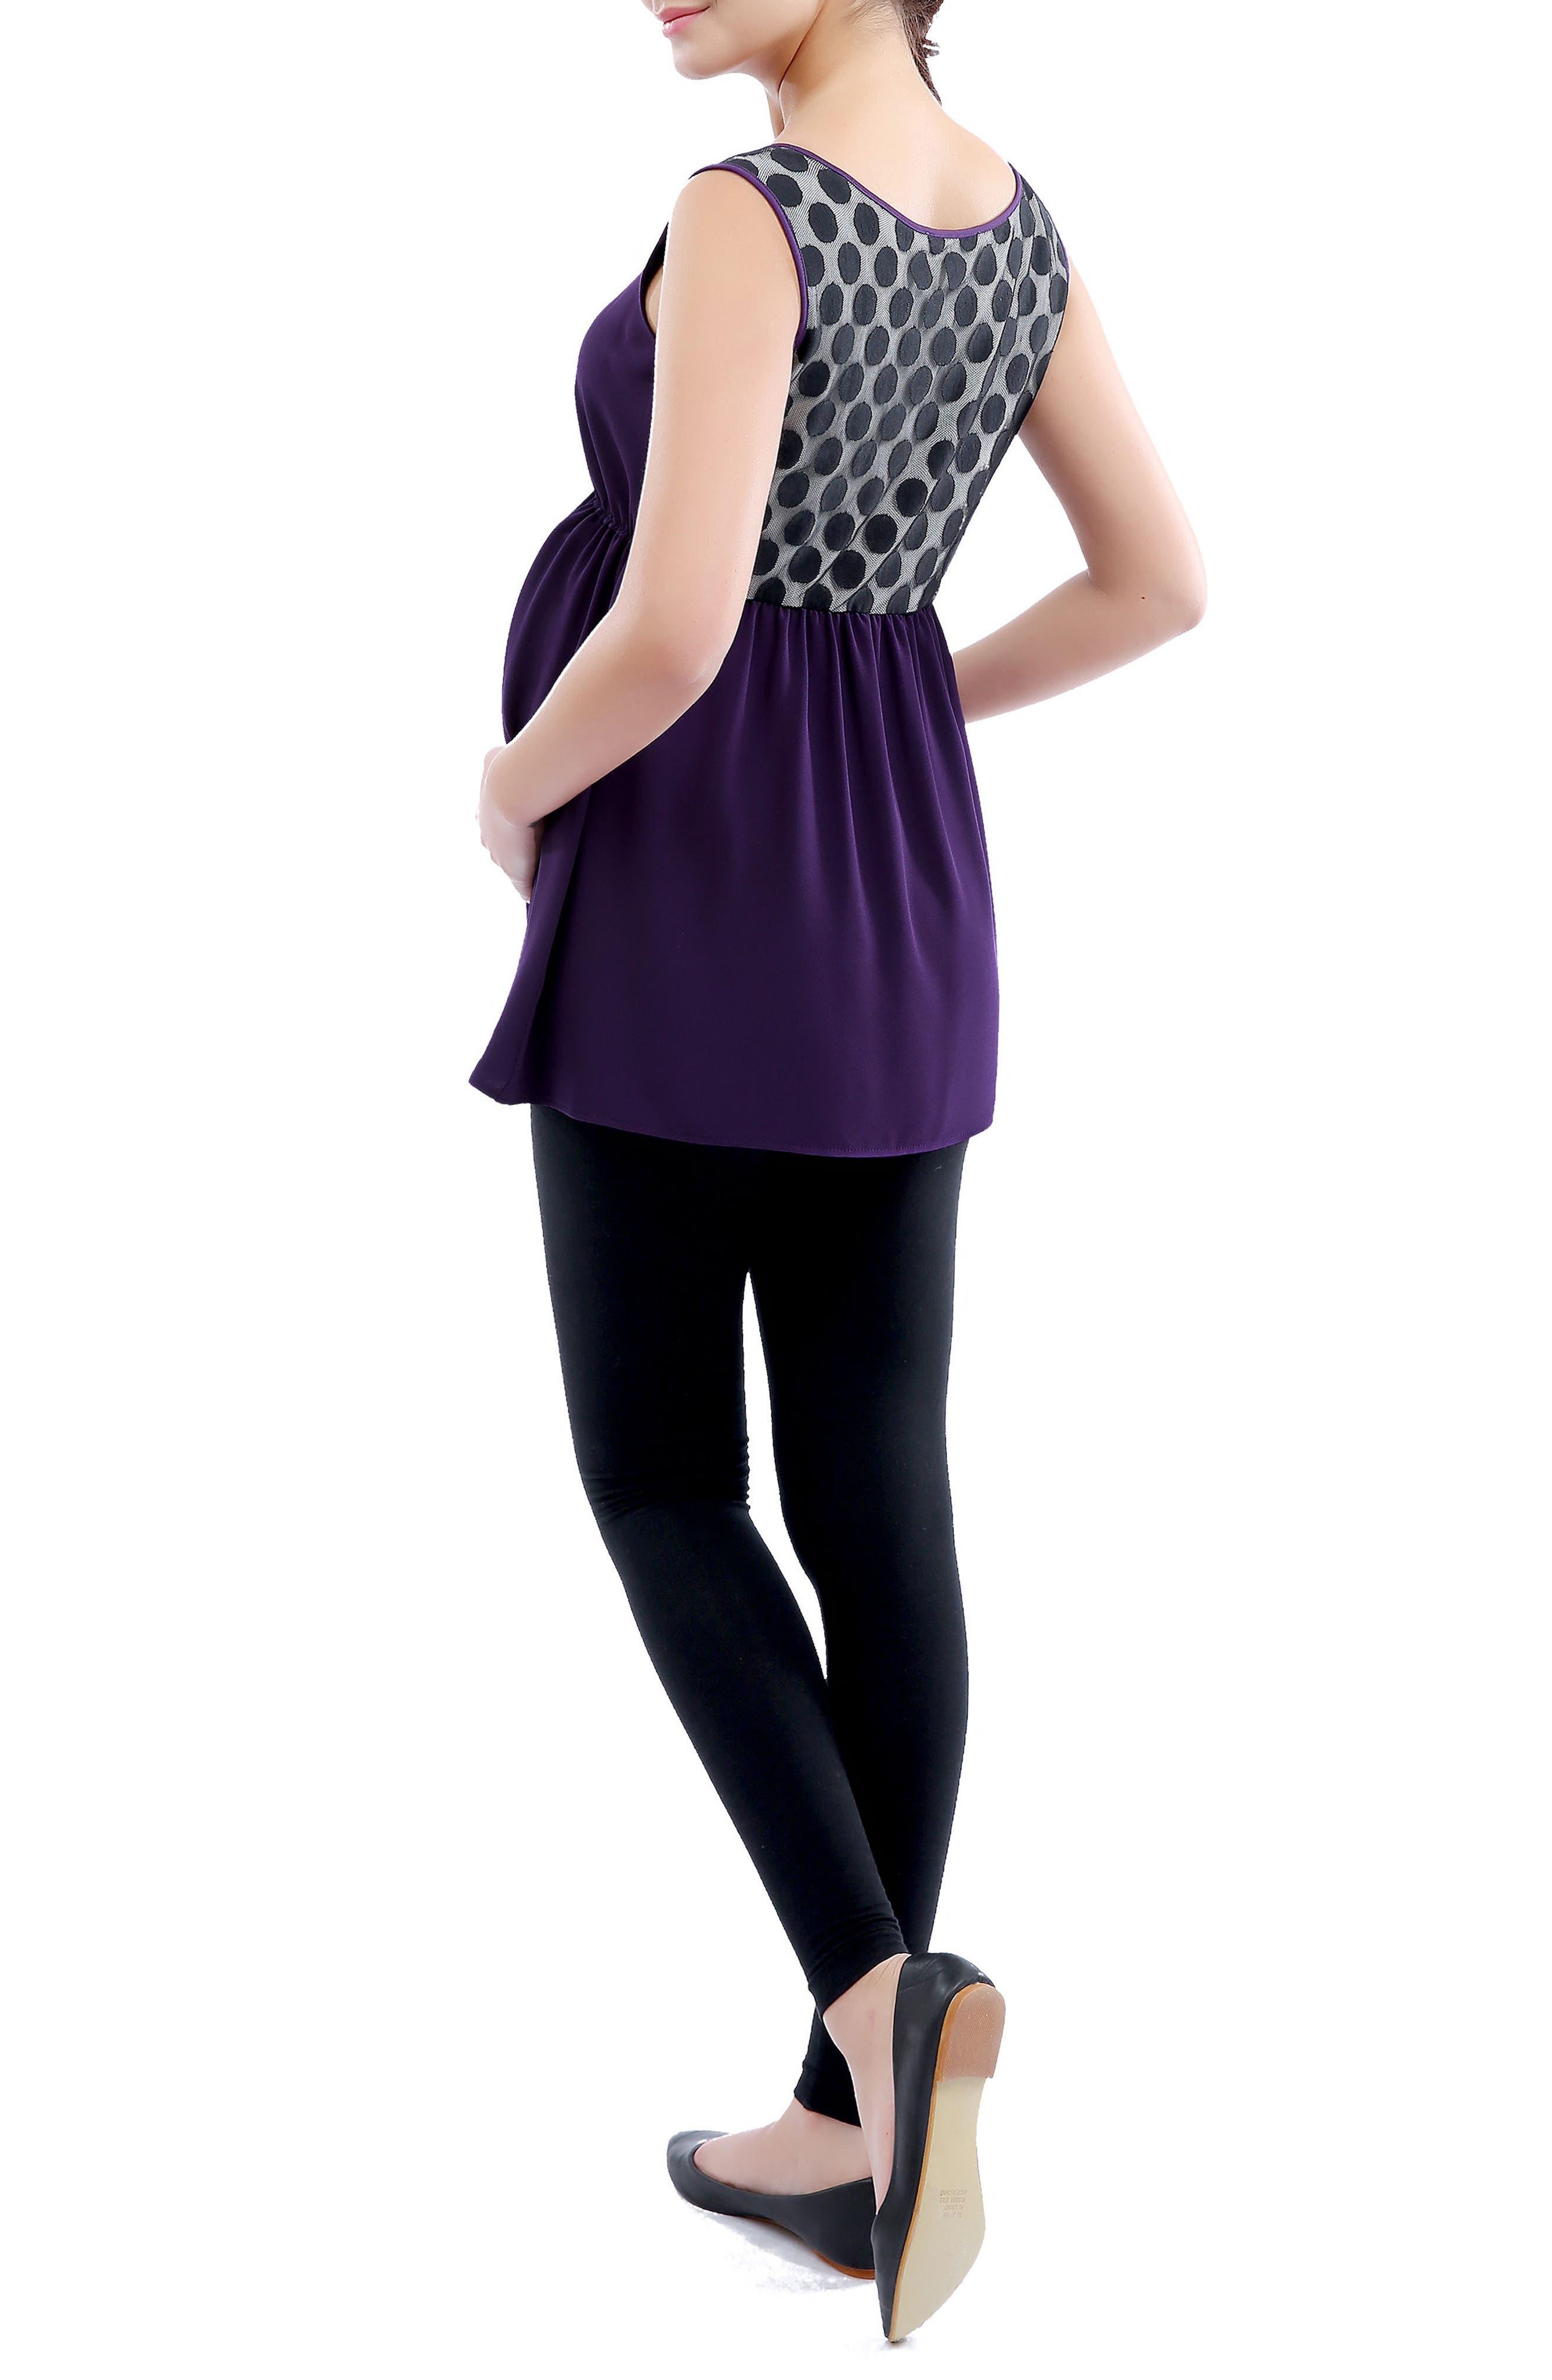 Alternate Image 3  - Kimi and Kai 'Amber' Polka Dot Lace Back Maternity Top